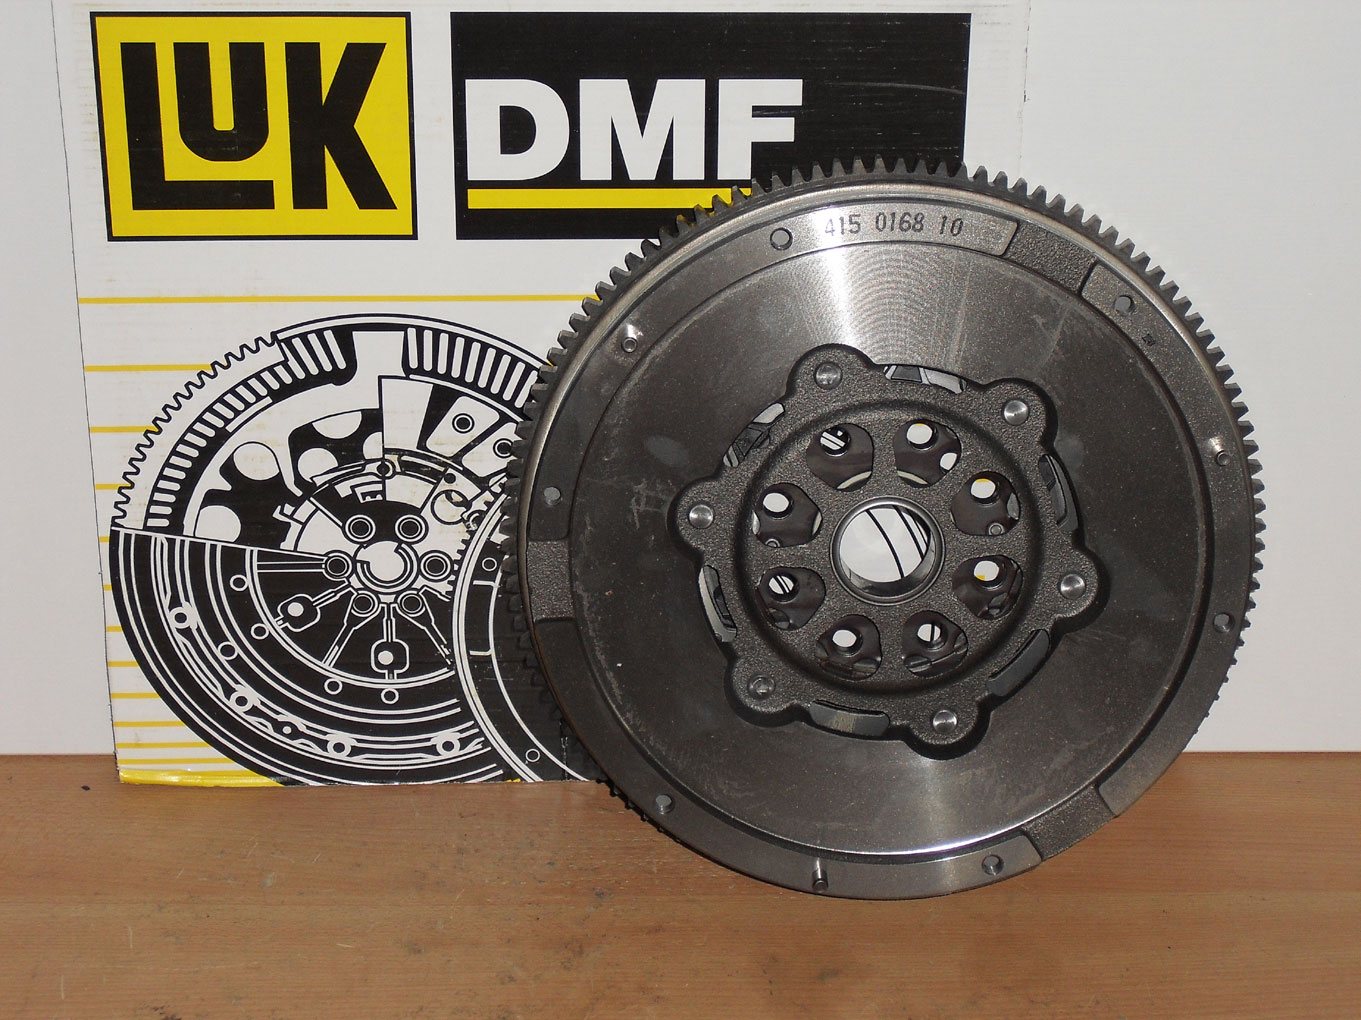 LuK 415 0168 10 Zms Volante Motor